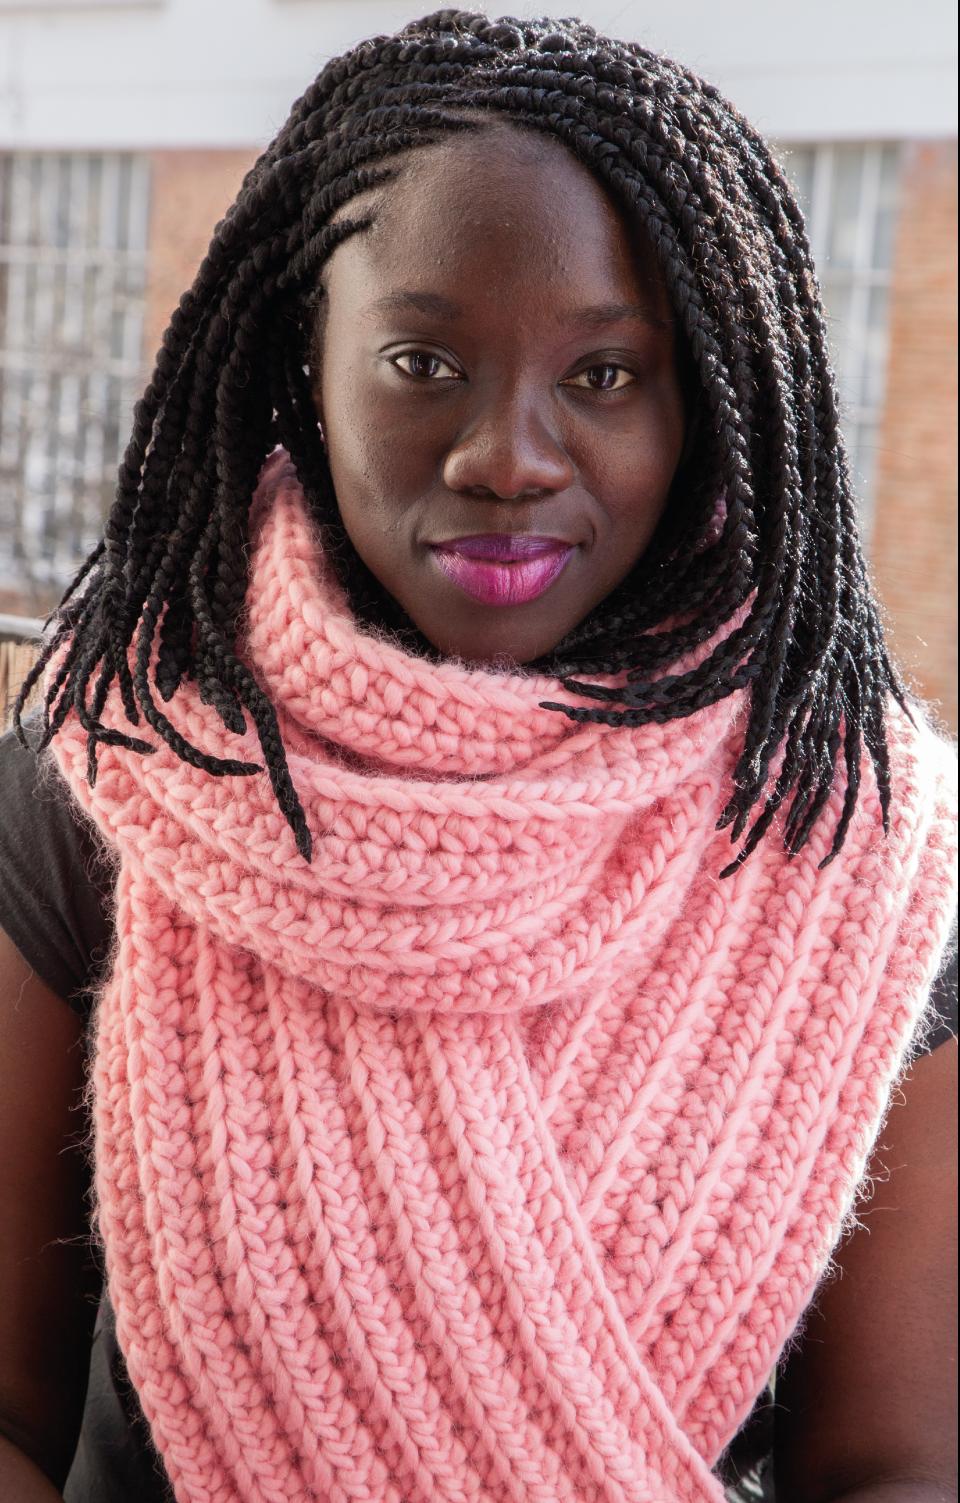 TRICOT) Mon écharpe bubblegum – Kesi Art, le blog ! 0018bc0364a